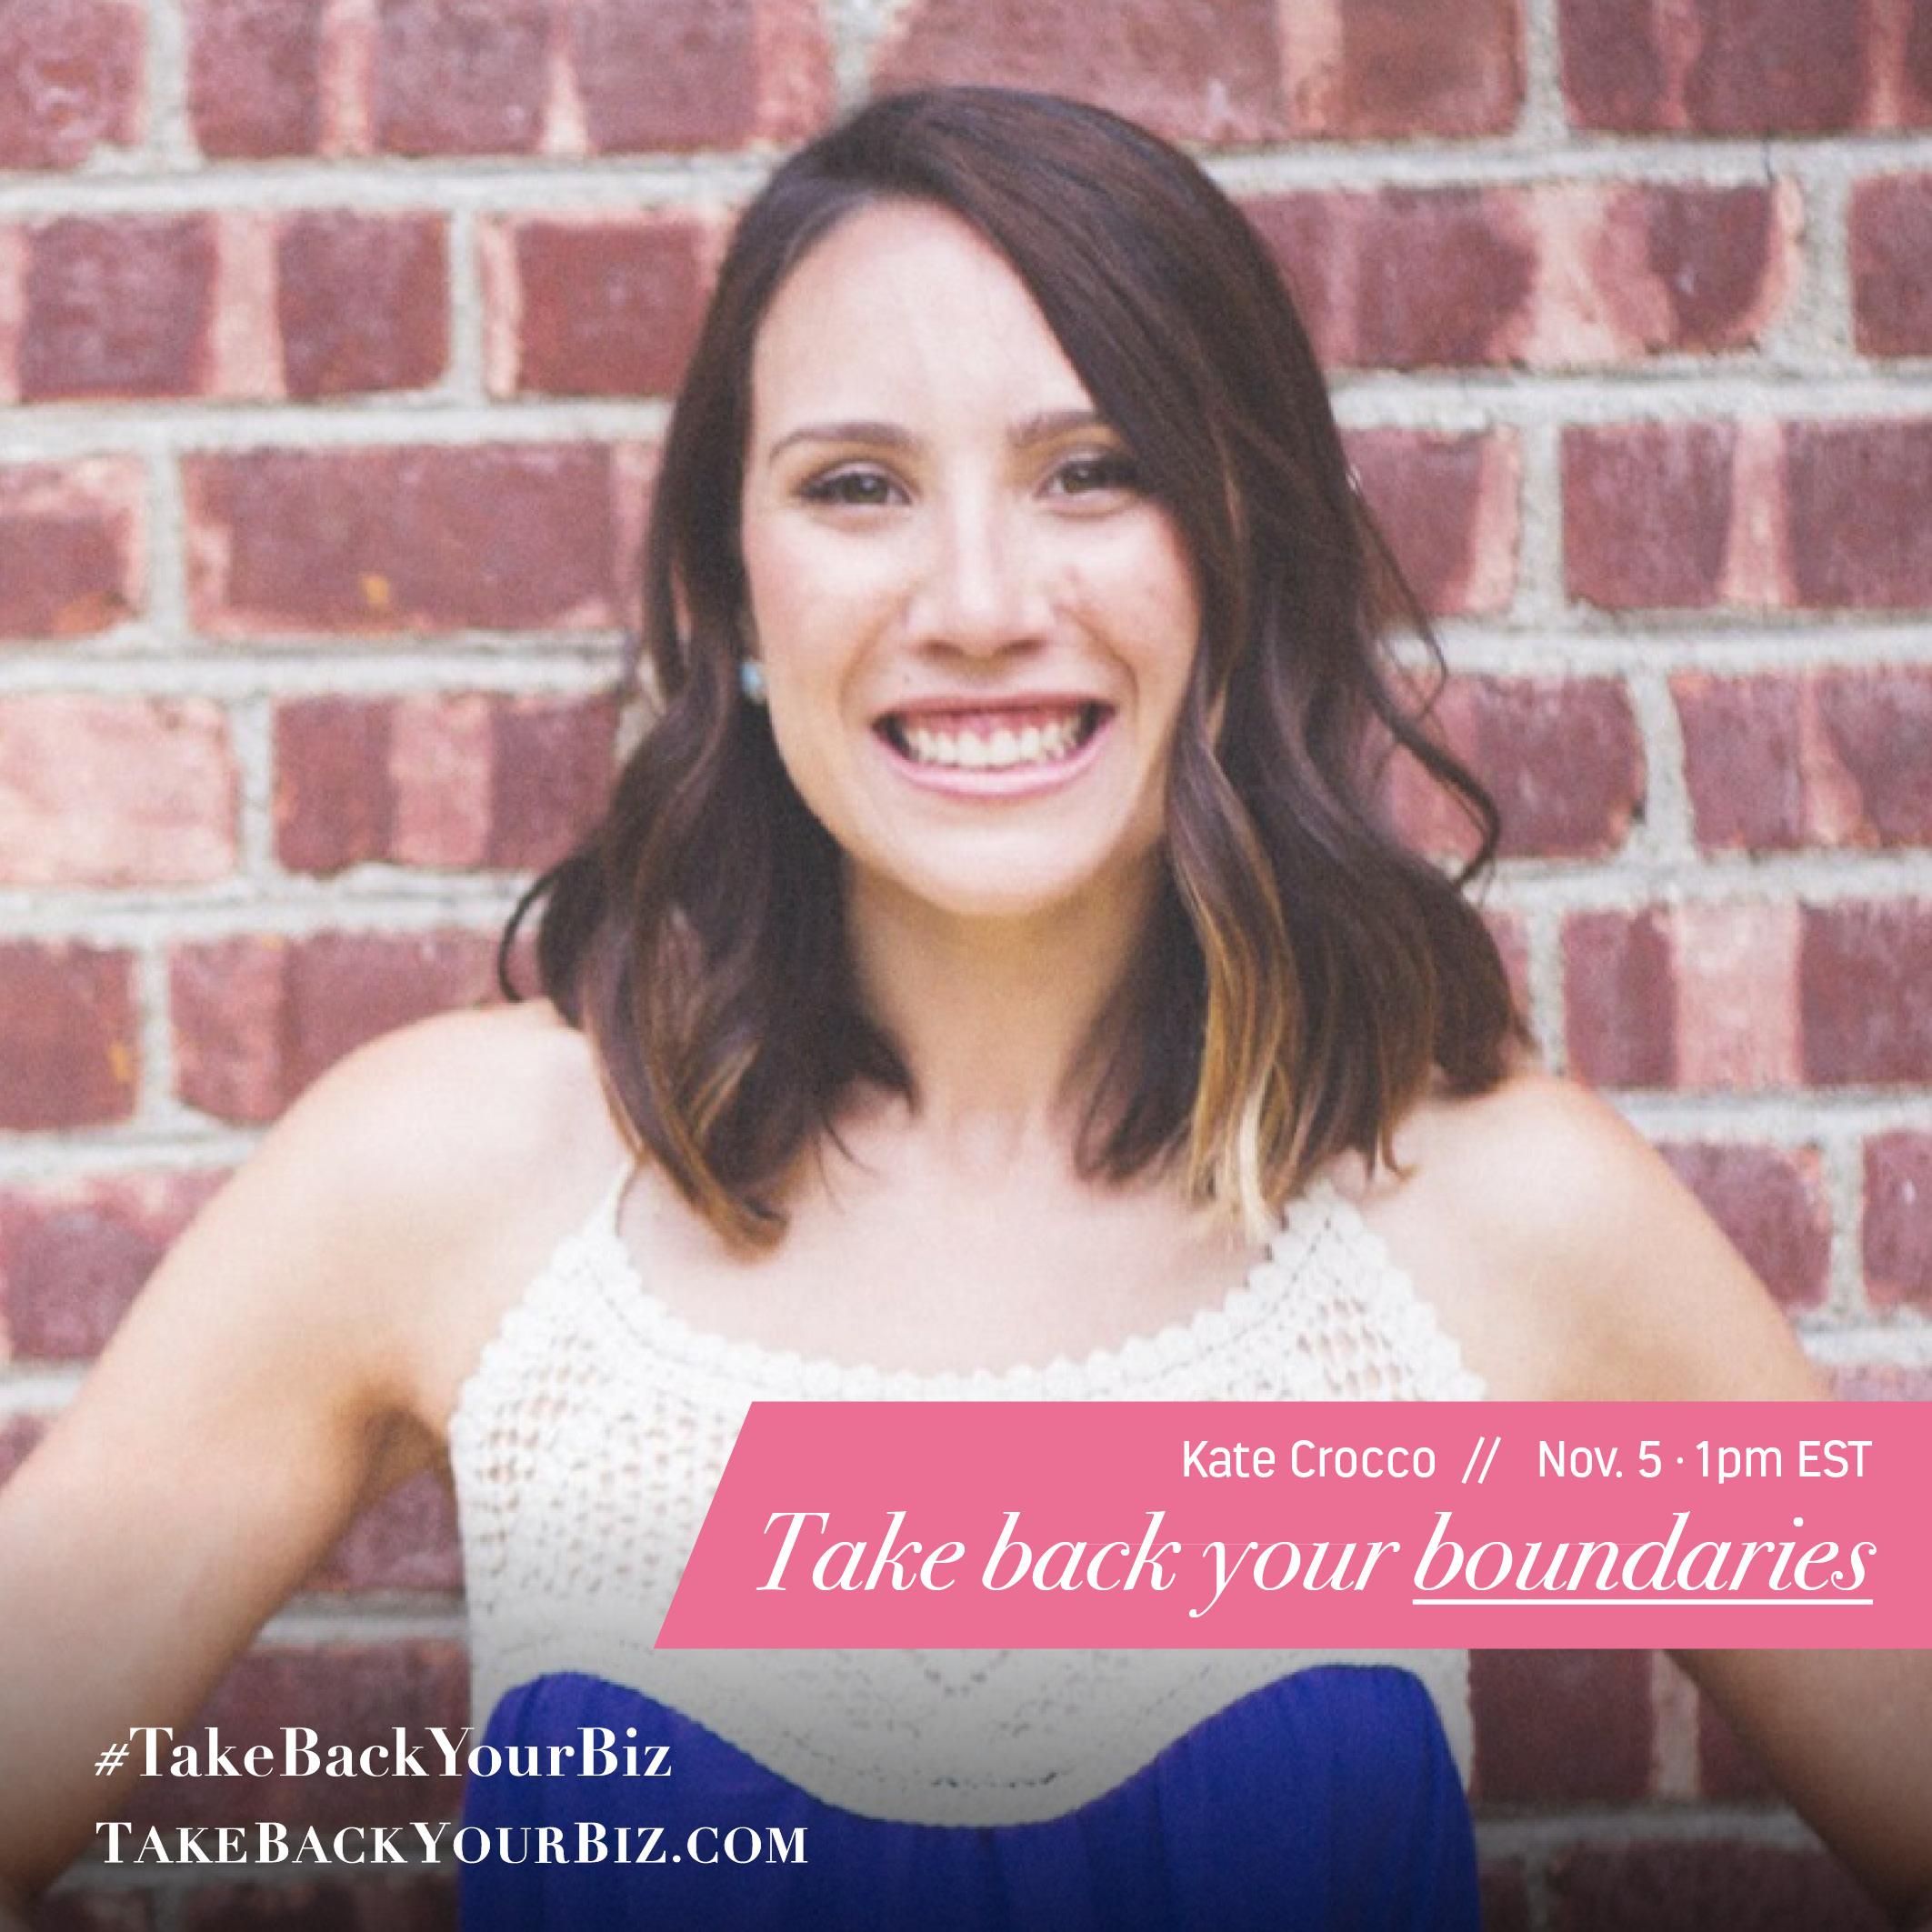 Take-Back-Your-Biz-Speakers-Kate-Crocco